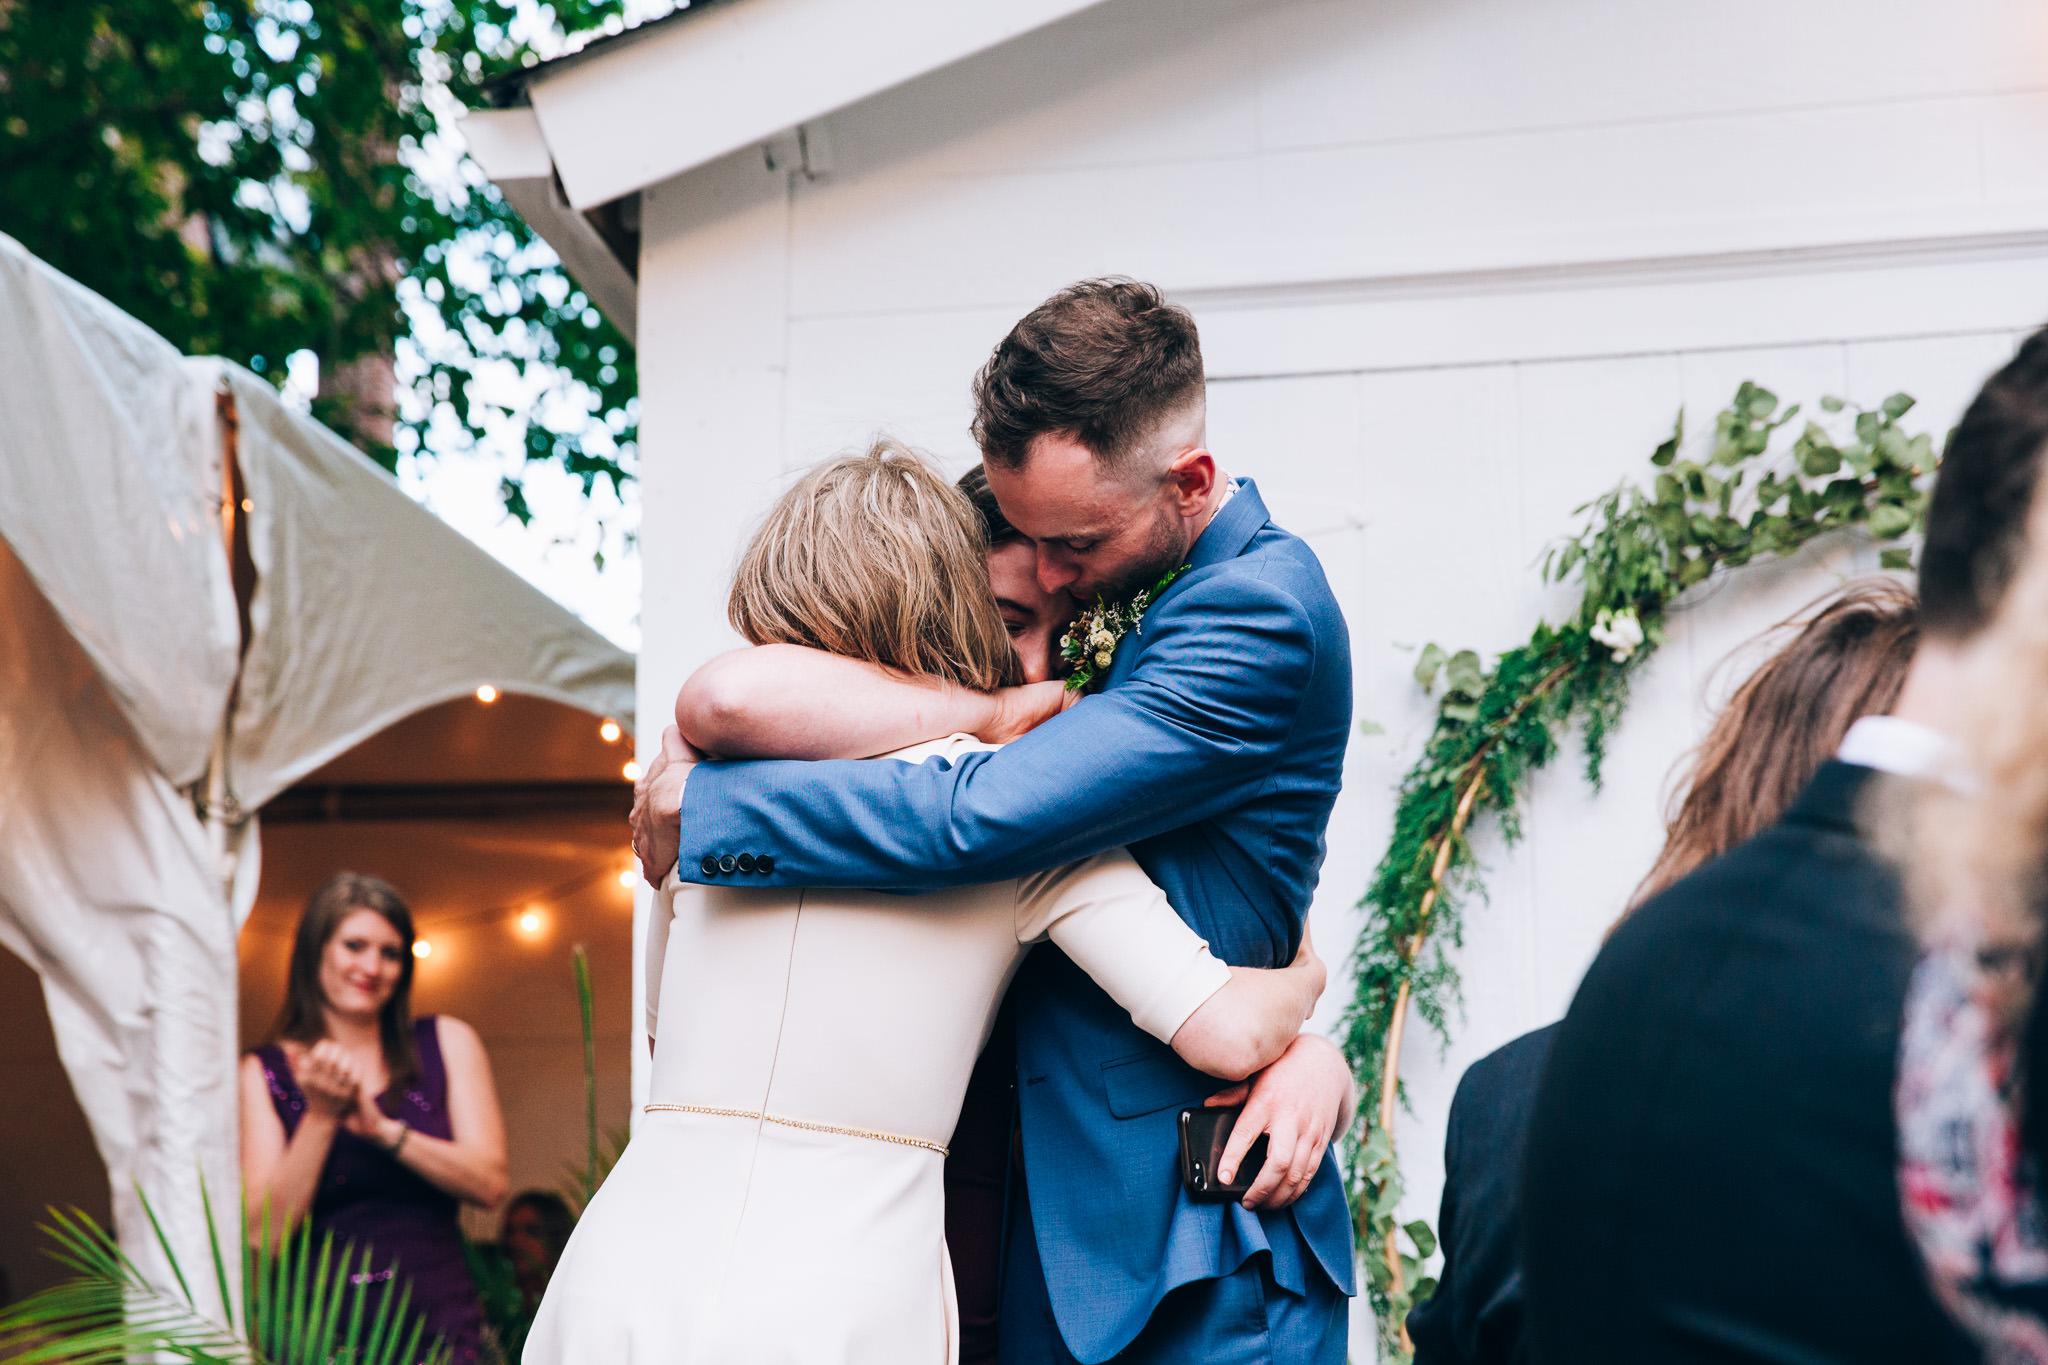 072_Canada-documentary-wedding-photograp